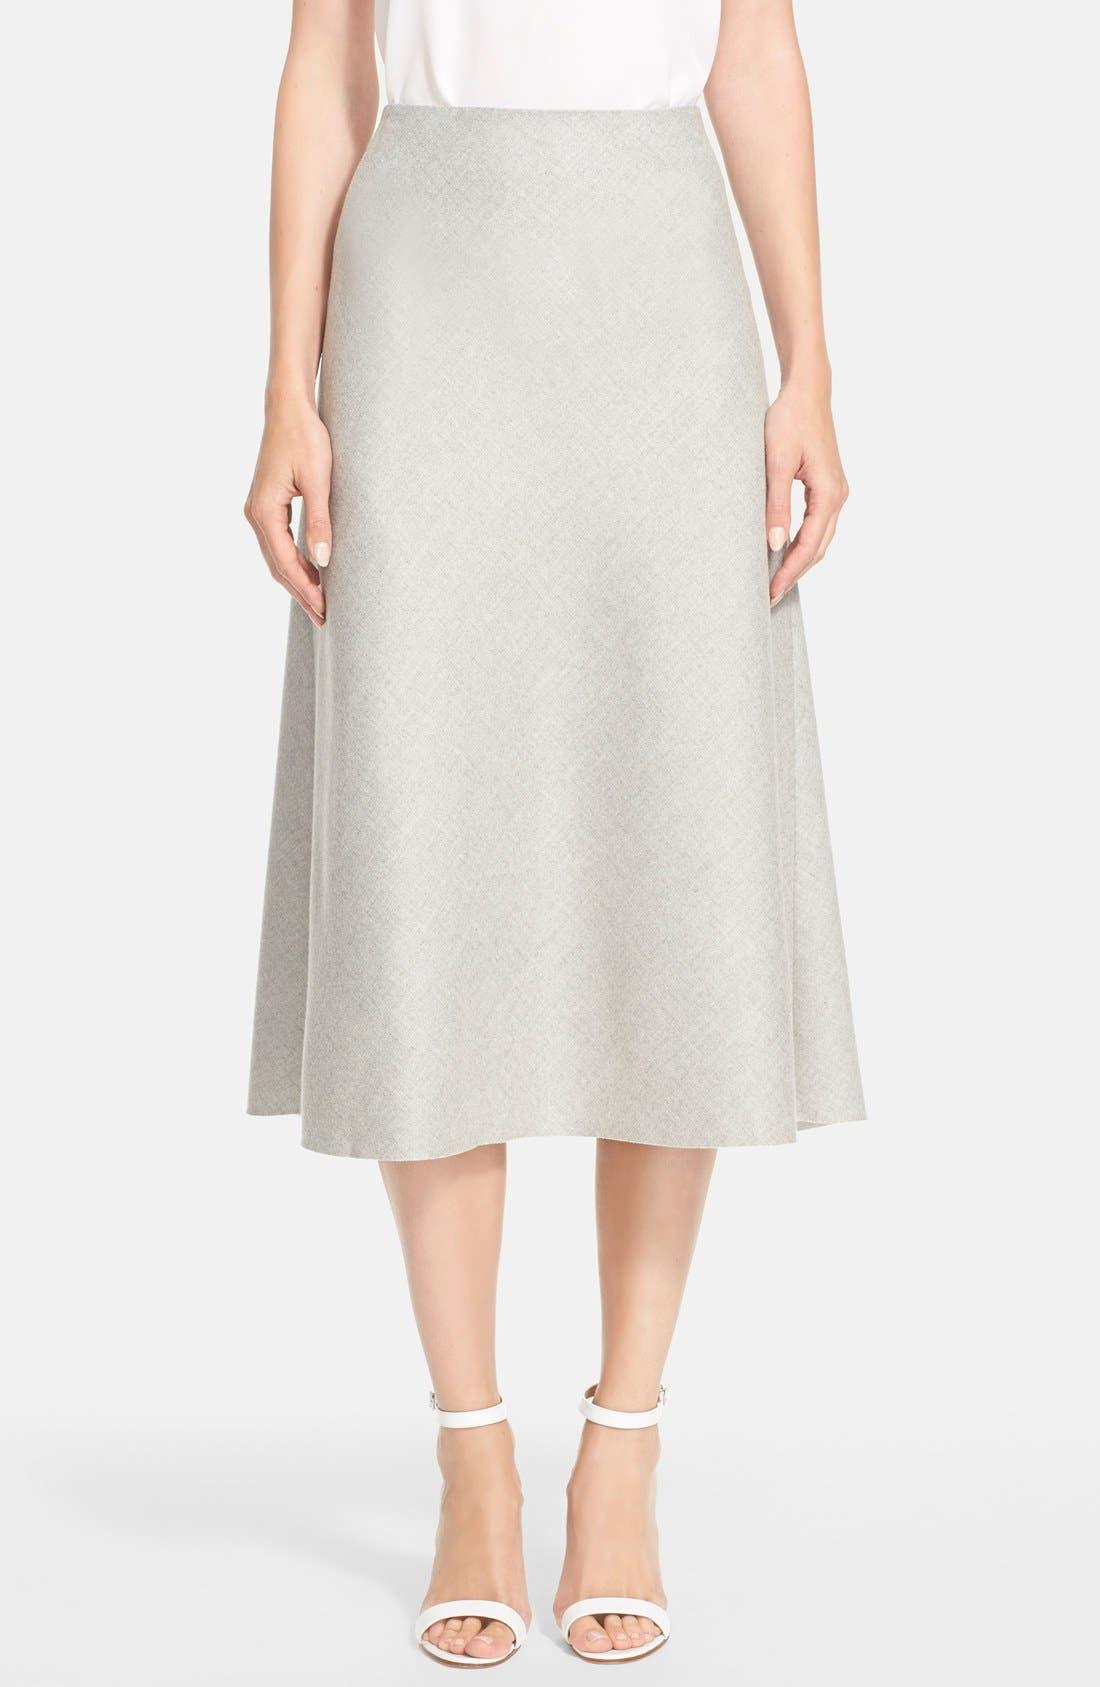 'Jahneem' Flannel Skirt,                             Main thumbnail 1, color,                             050